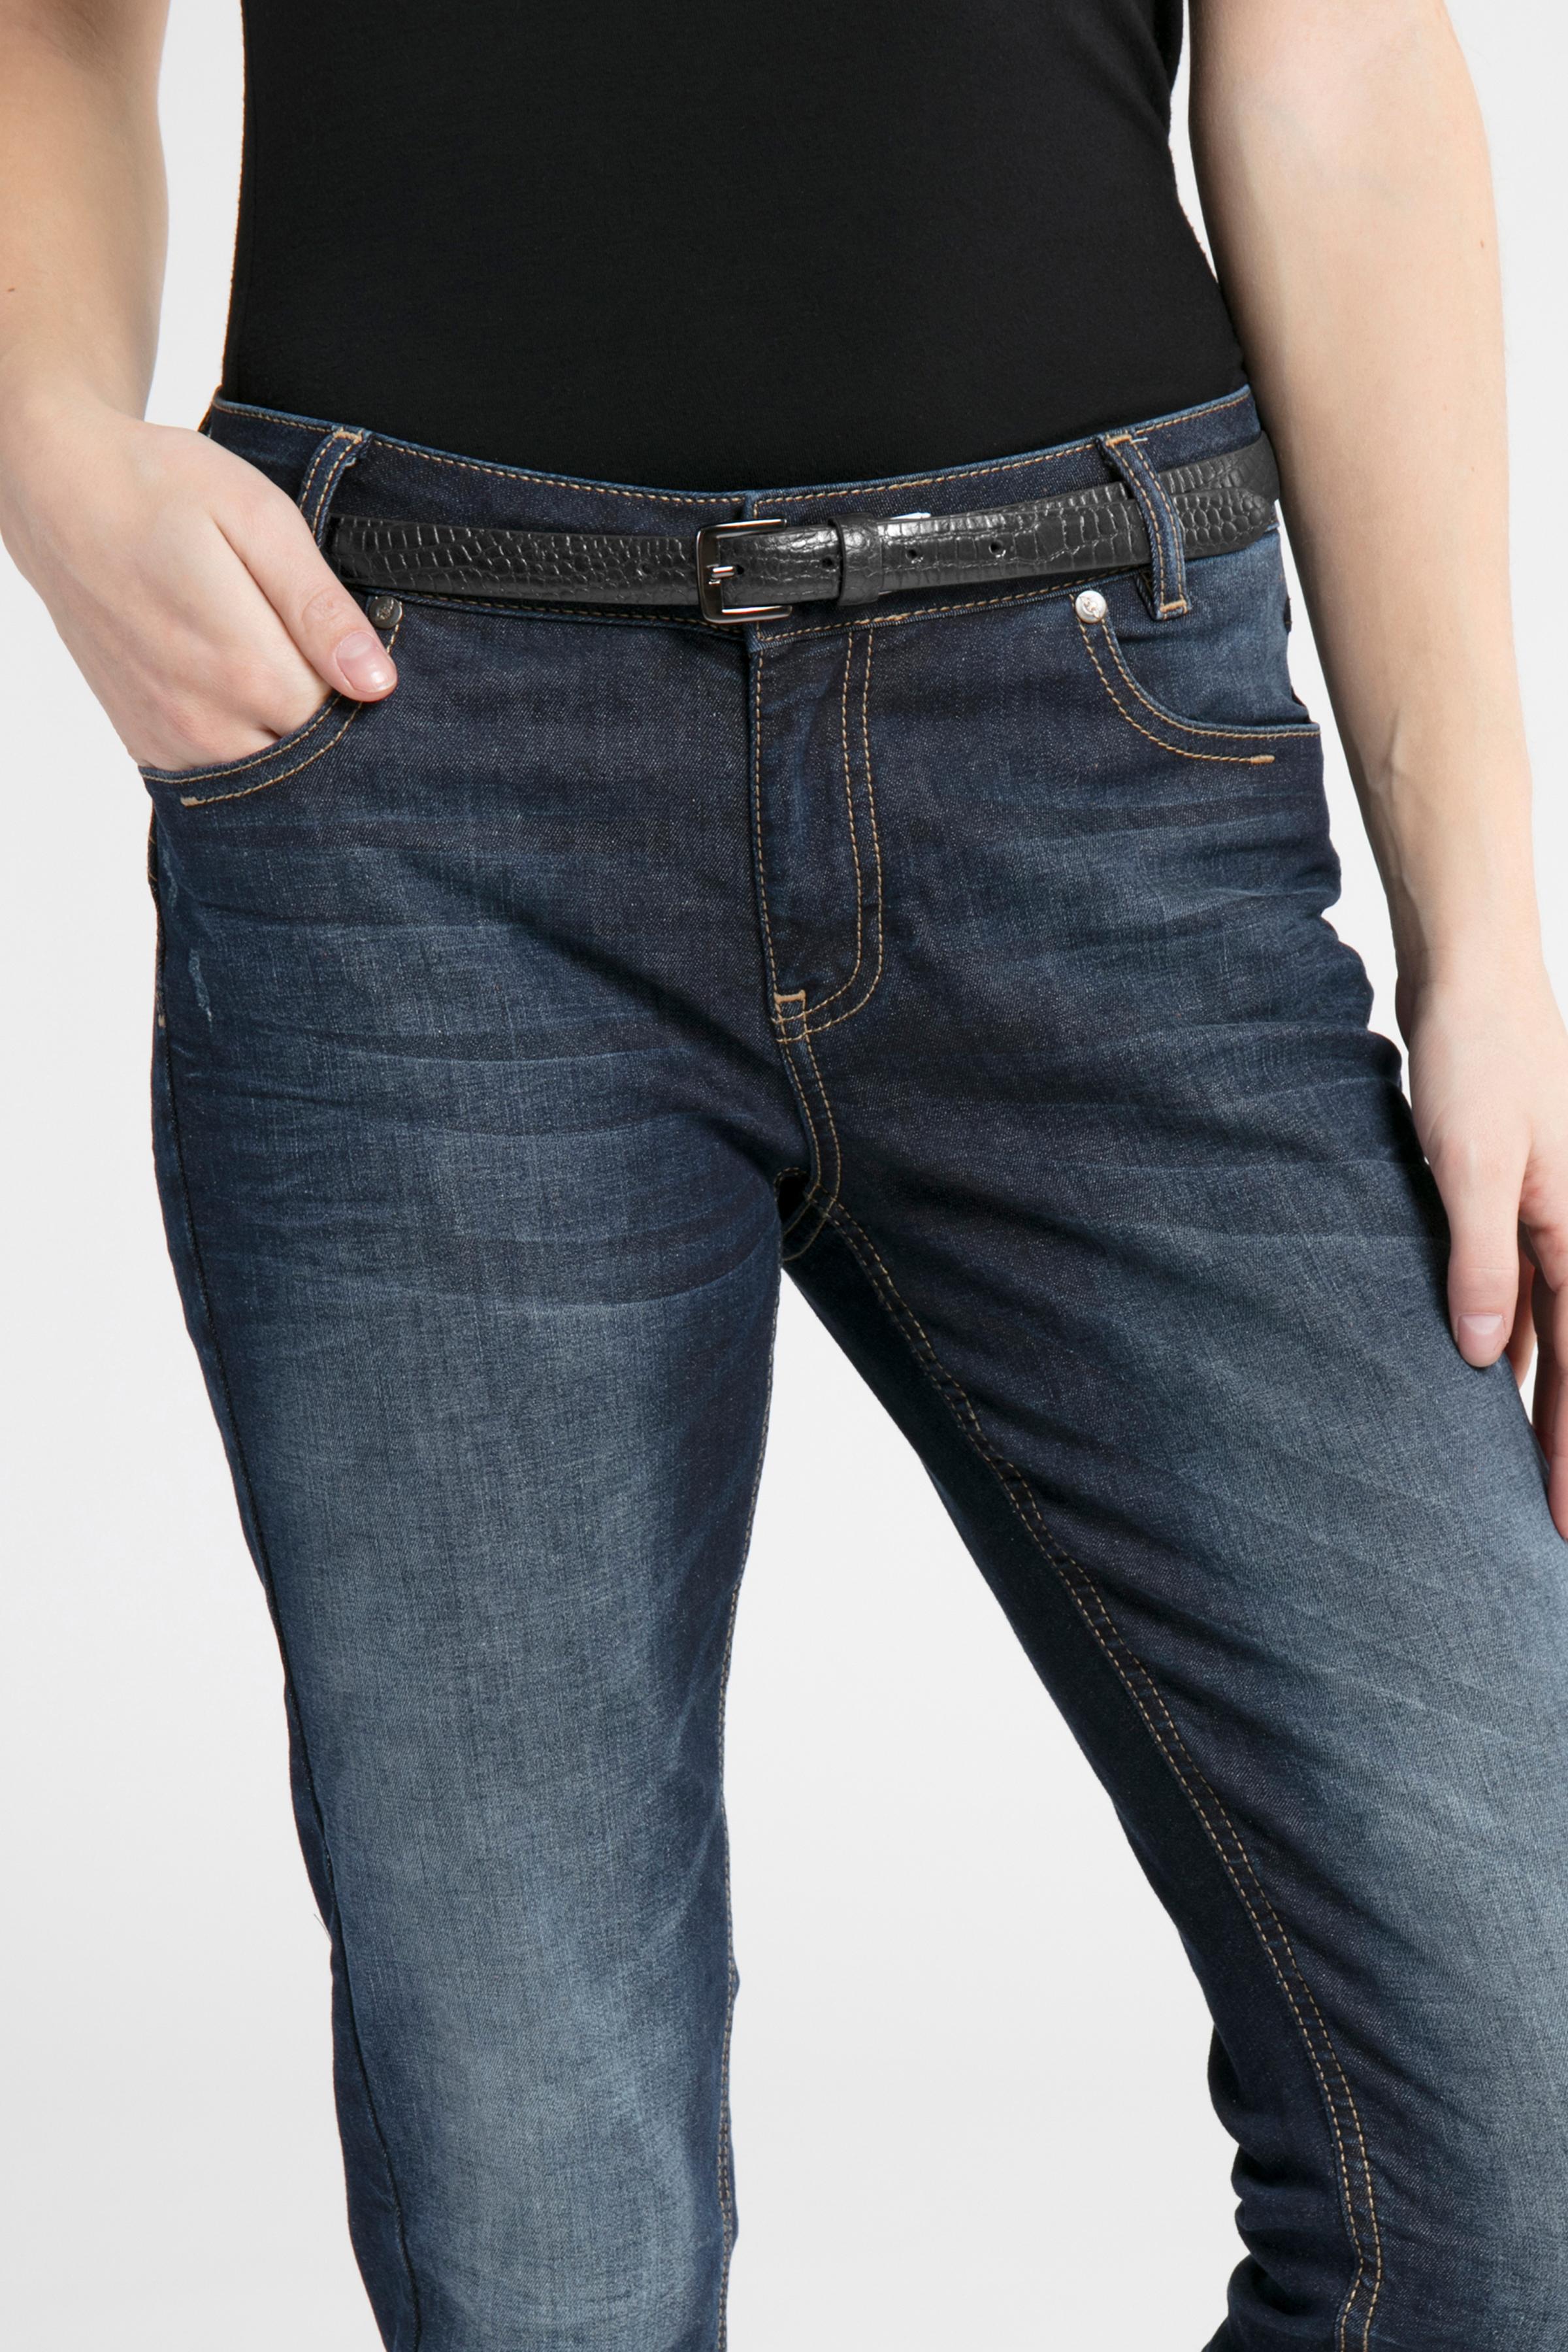 Svart Skinnbälte från Ichi - accessories – Köp Svart Skinnbälte från stl. 85-95 här